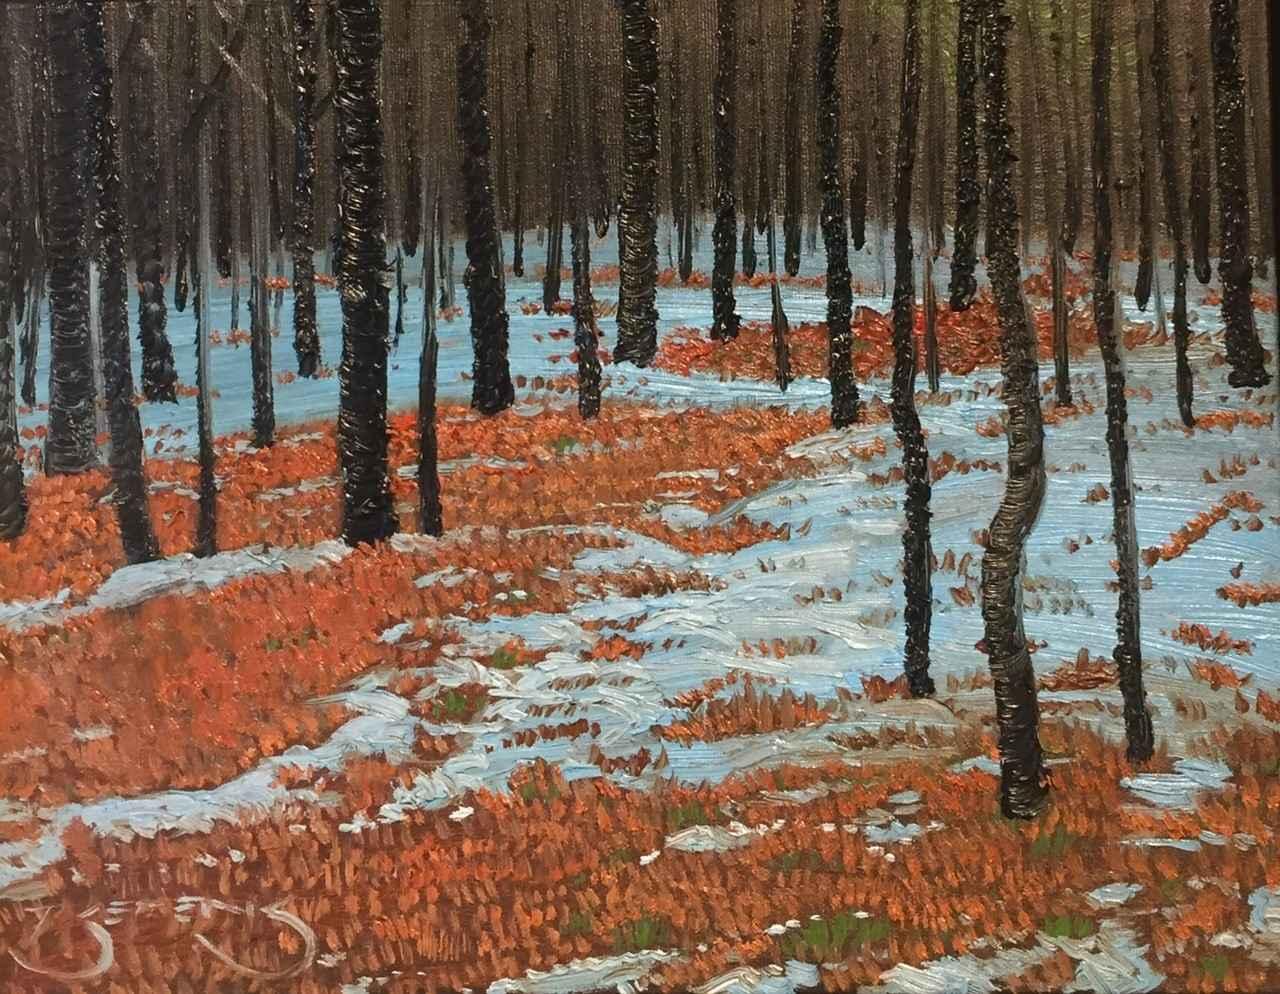 Spring Melt #2 Noisy ... by  Mark Berens - Masterpiece Online